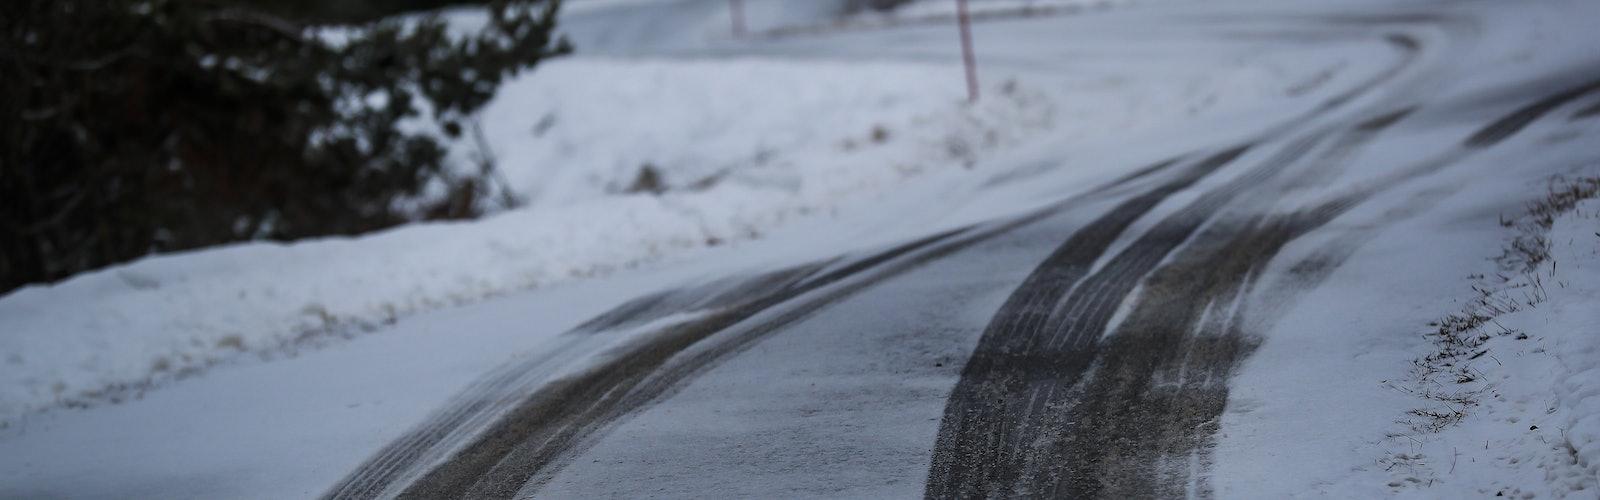 WRC_2021_Rd1._019